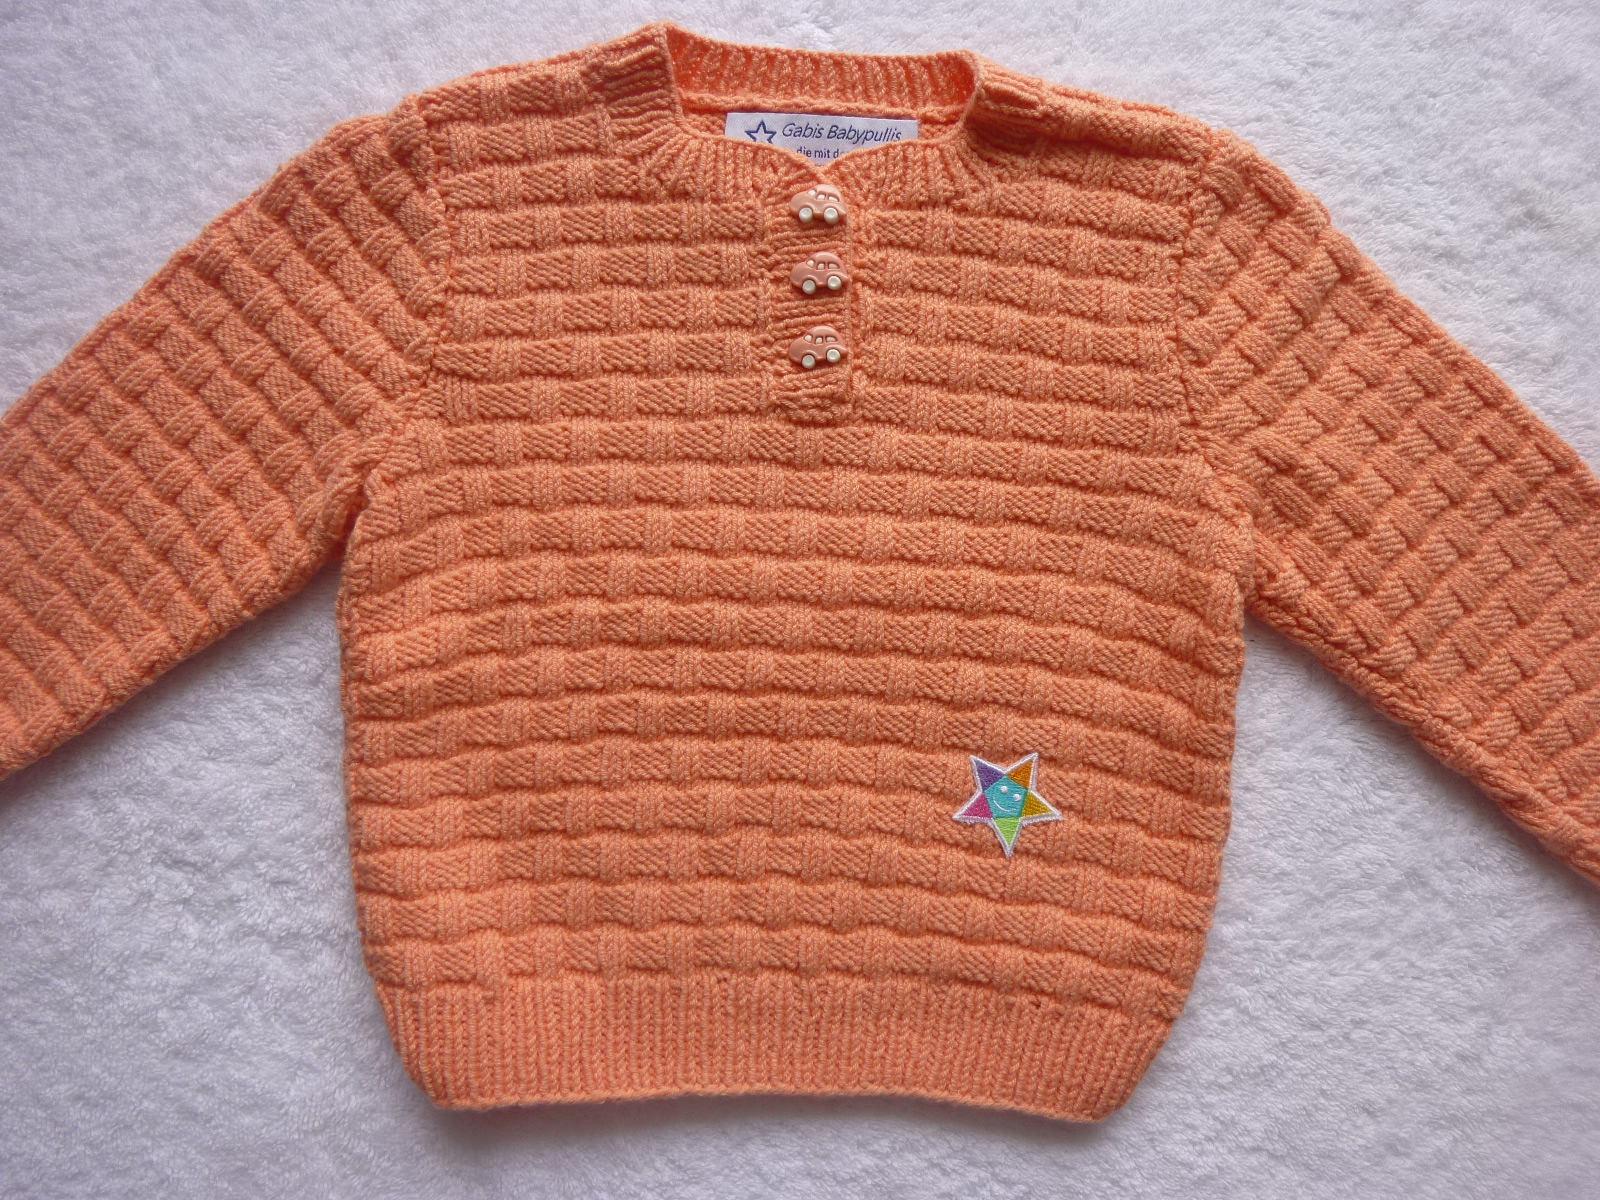 - Kinderpullover Gr. 86/92 apricot Baumwolle - Kinderpullover Gr. 86/92 apricot Baumwolle